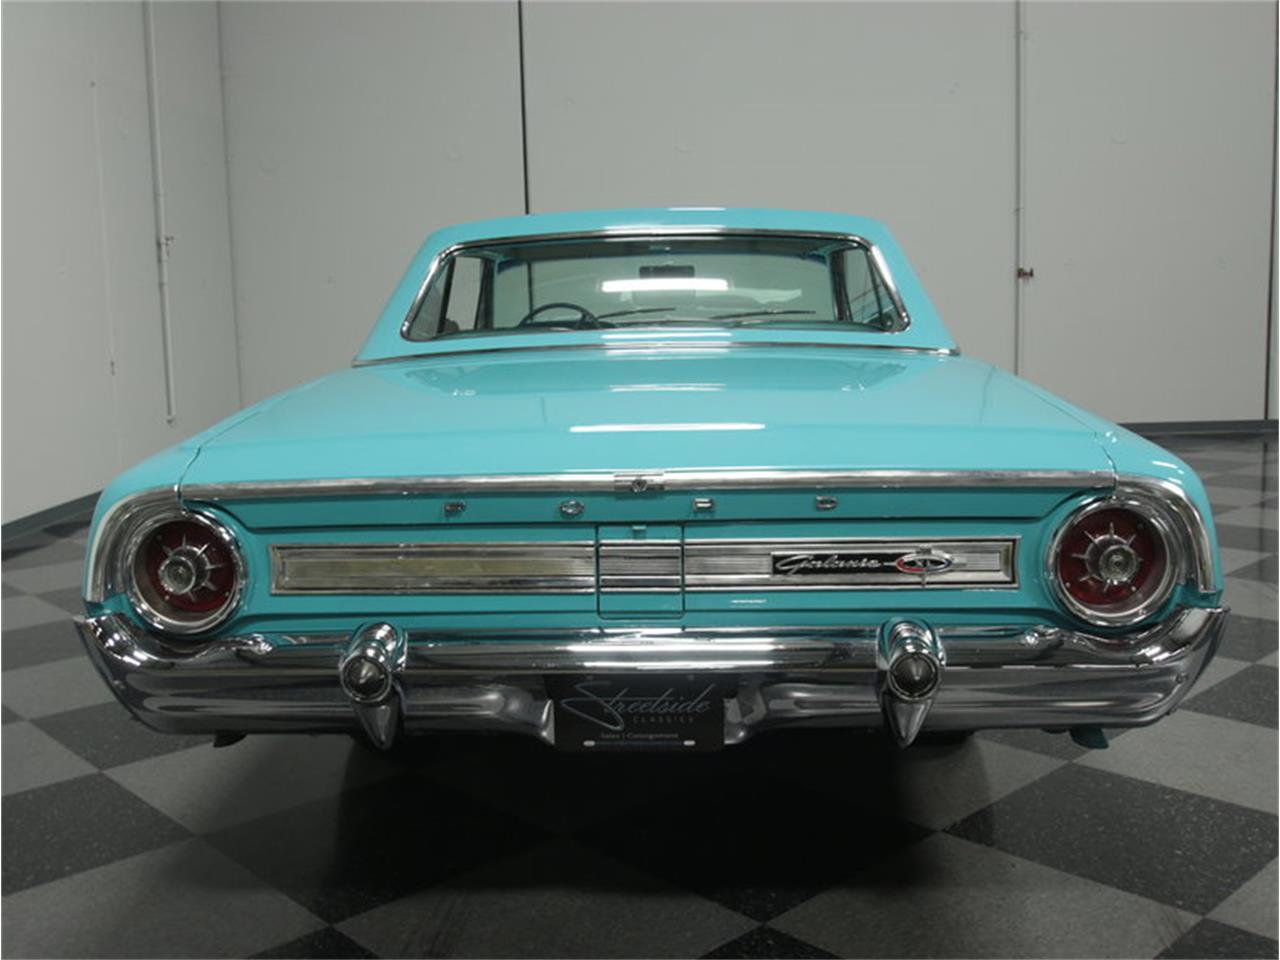 Atlanta Ford Dealers >> 1964 Ford Galaxie 500 XL for Sale | ClassicCars.com | CC-776127